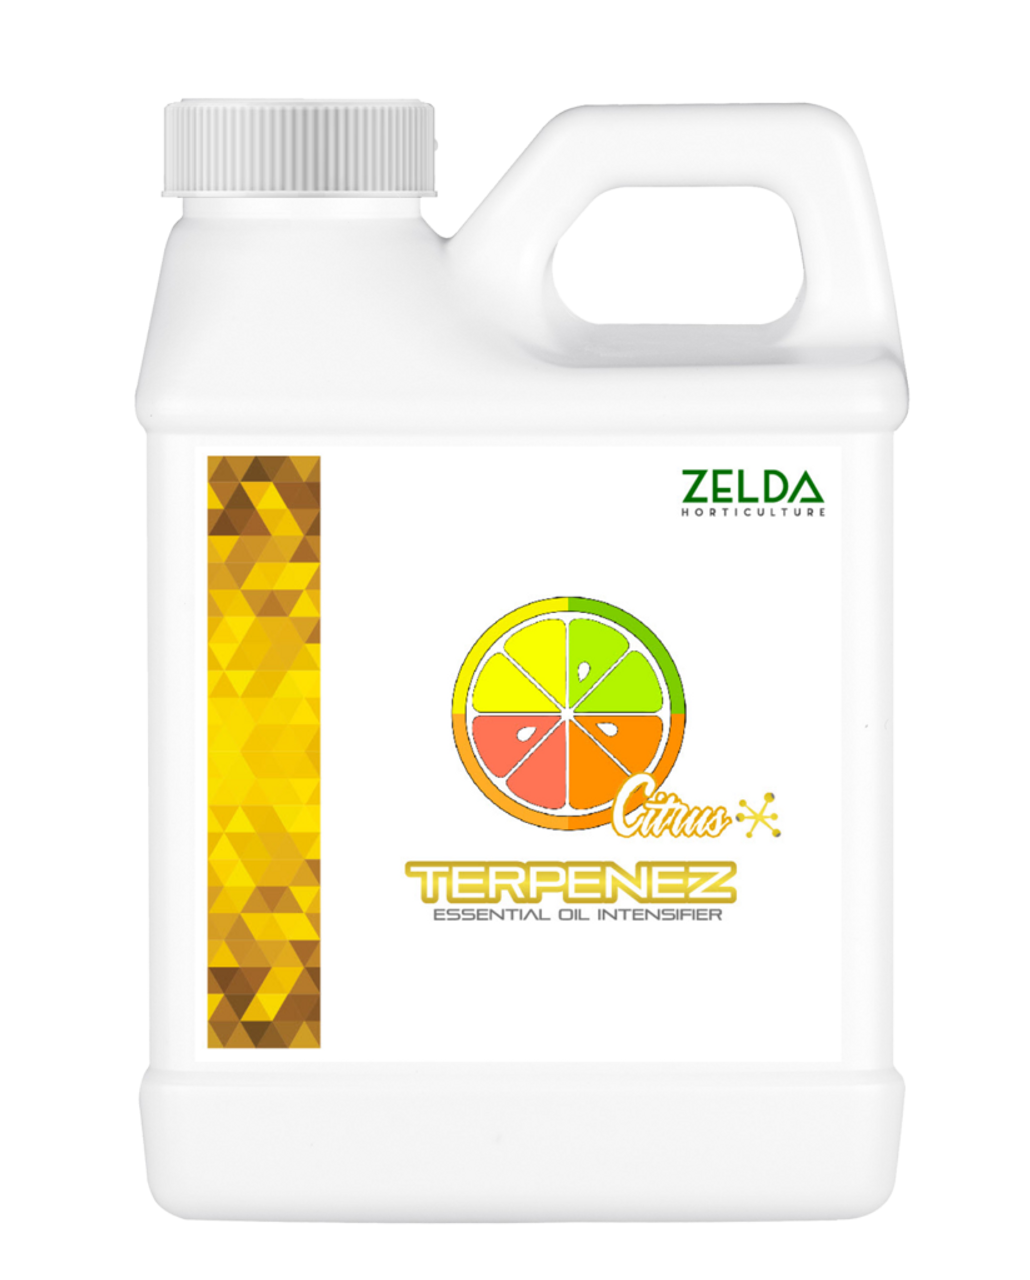 Terpenez - Citrus Essential Oil Intensifier- Pint